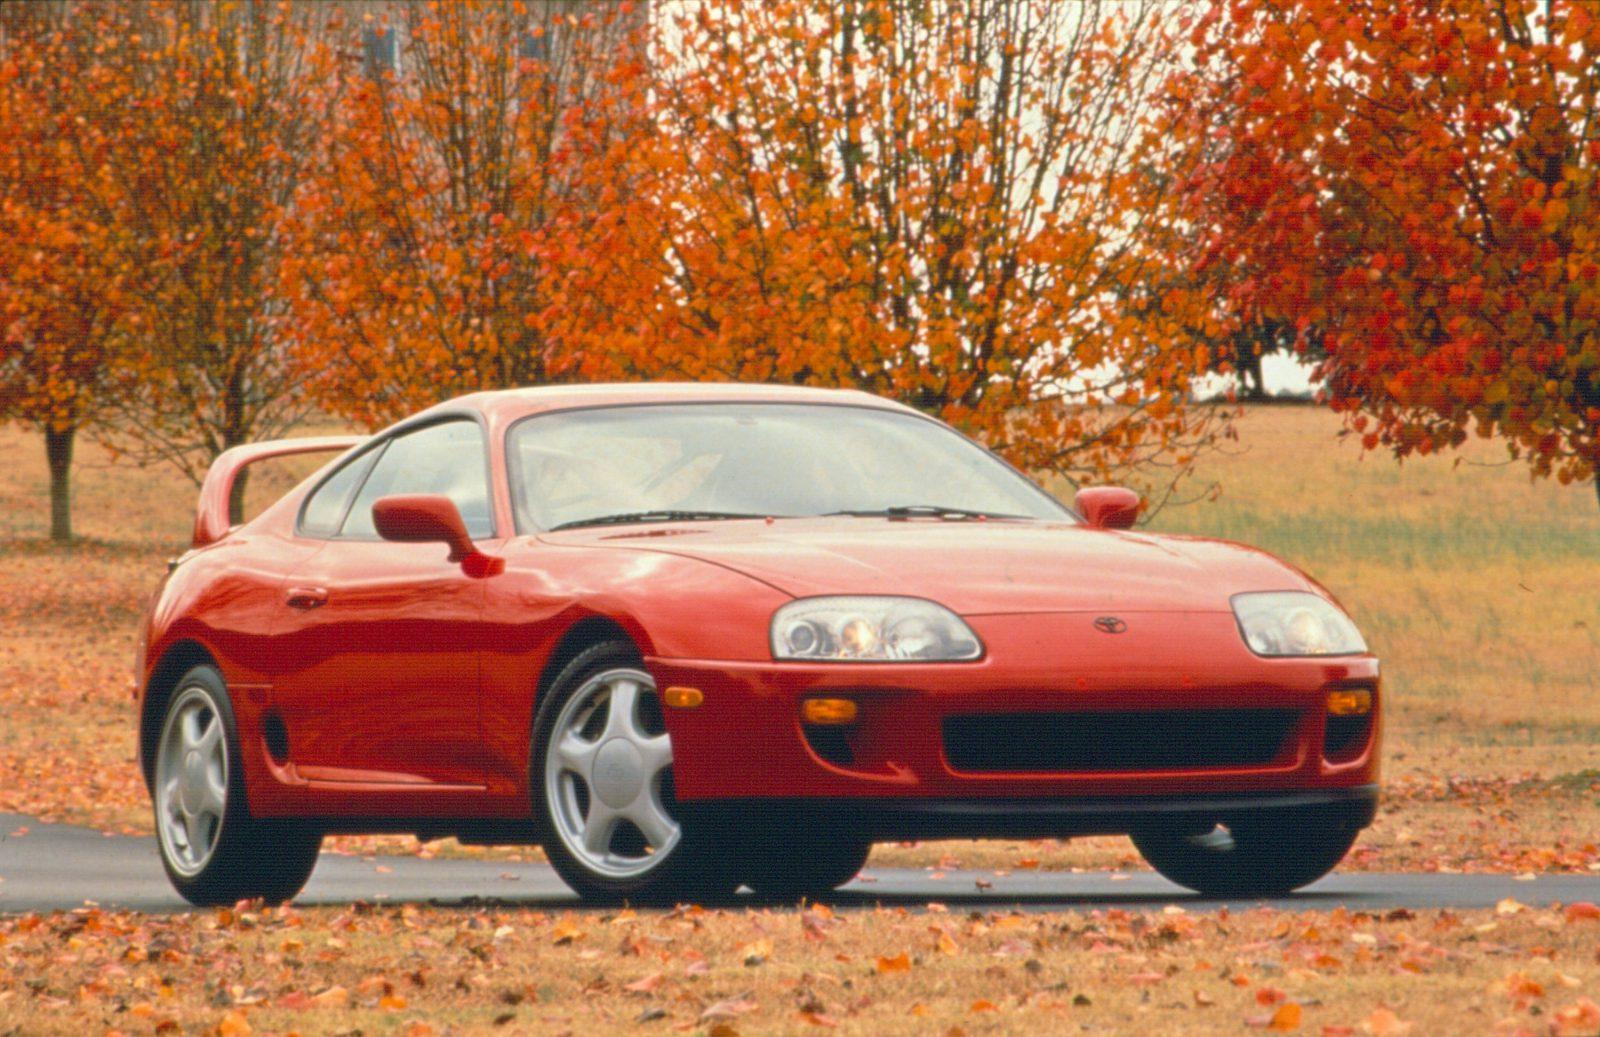 attachment modded forums sale forum automobiles toyota larger name click version for views supra o size c porsche image